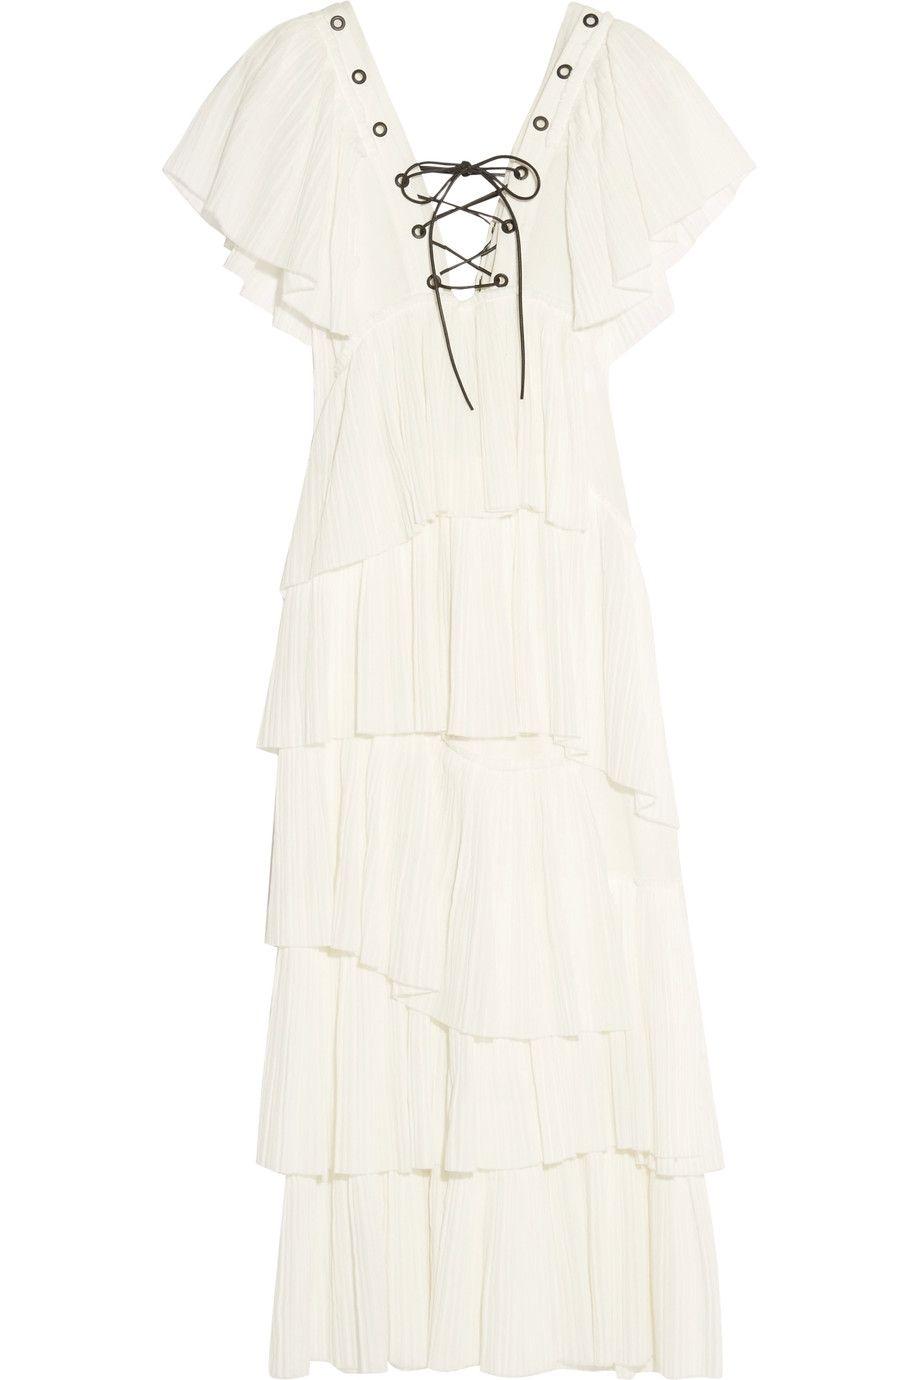 SONIA RYKIEL . #soniarykiel #cloth #dress